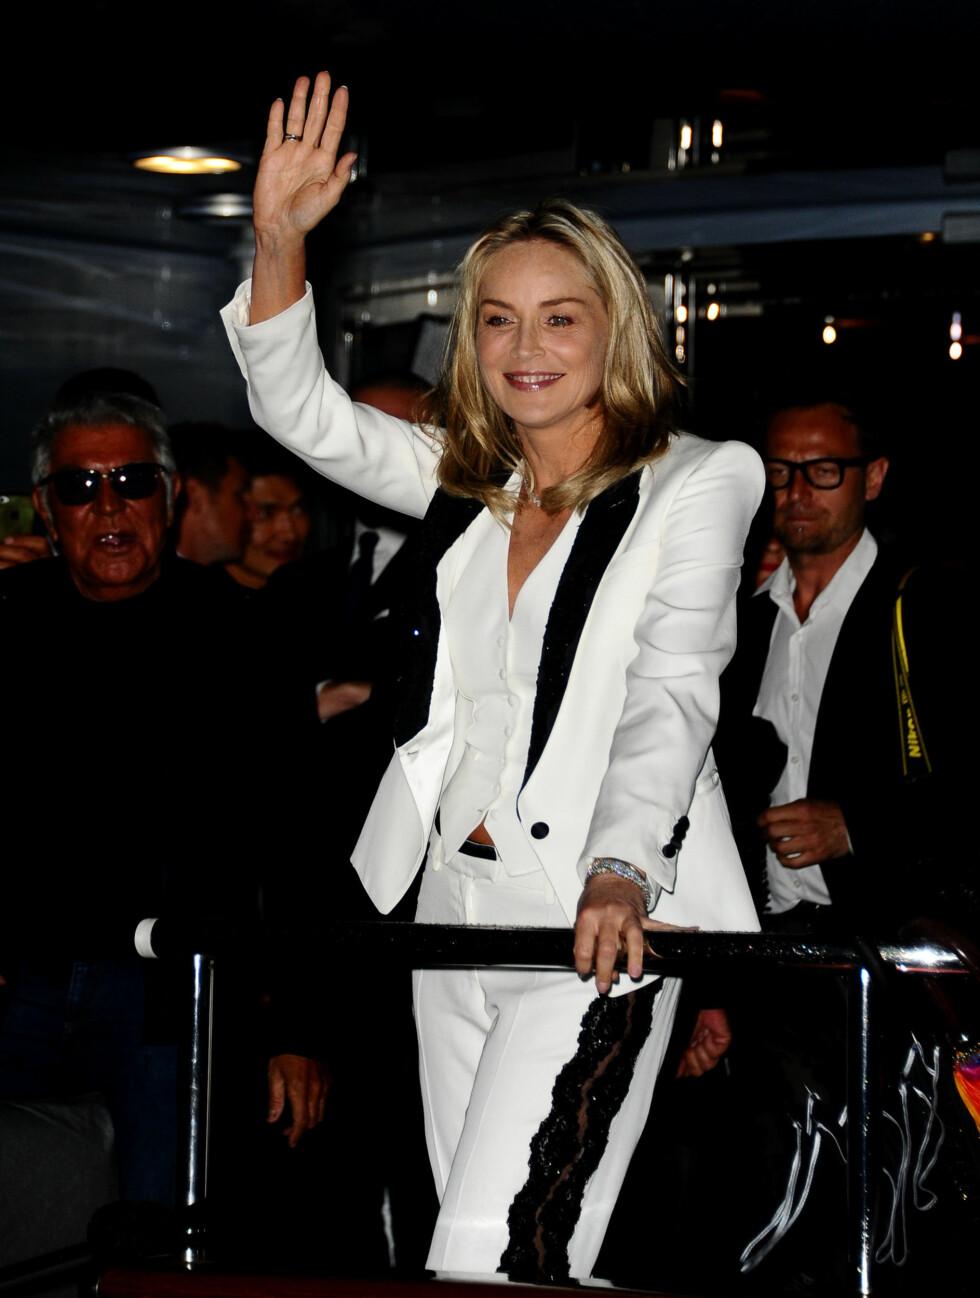 FLYTTET INN: Sharon Stone bodde på Robertos yacht under filmfestivalen i Cannes.  Foto: All Over Press